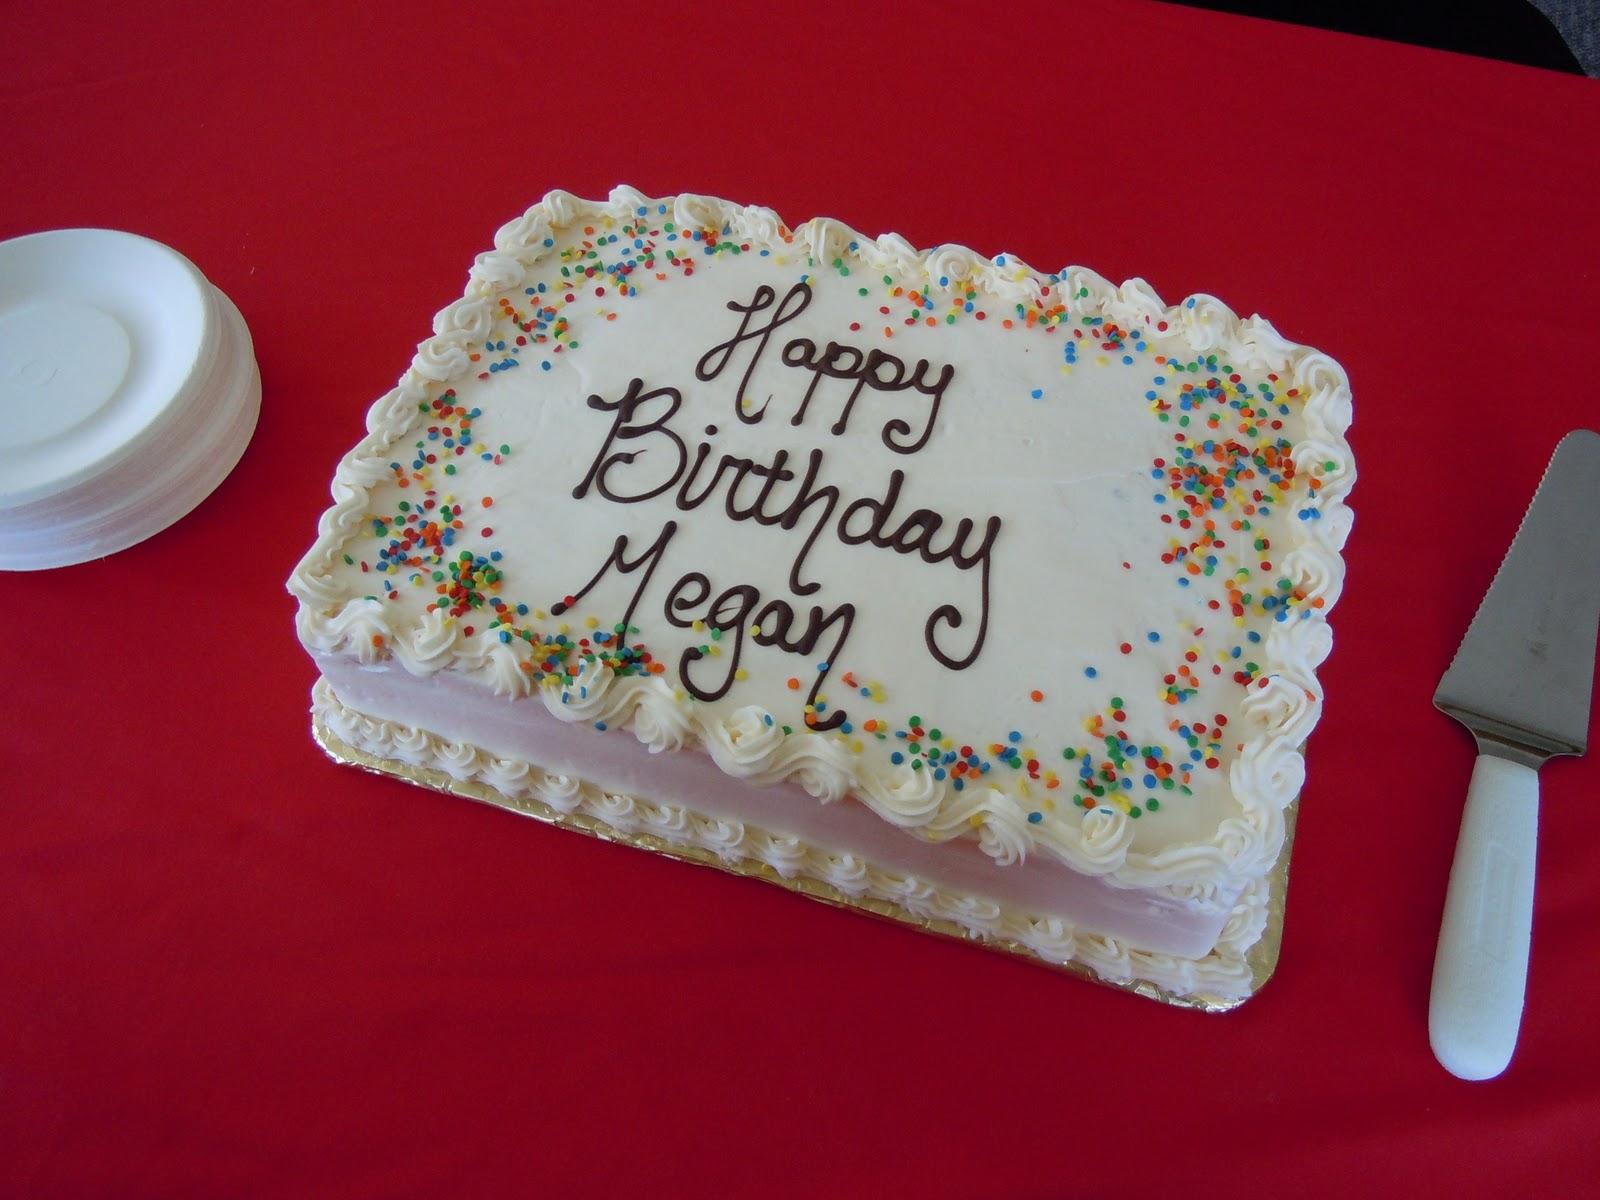 King Arthur Birthday Cake Recipe: The Clean Plate Club: King Arthur Part 1